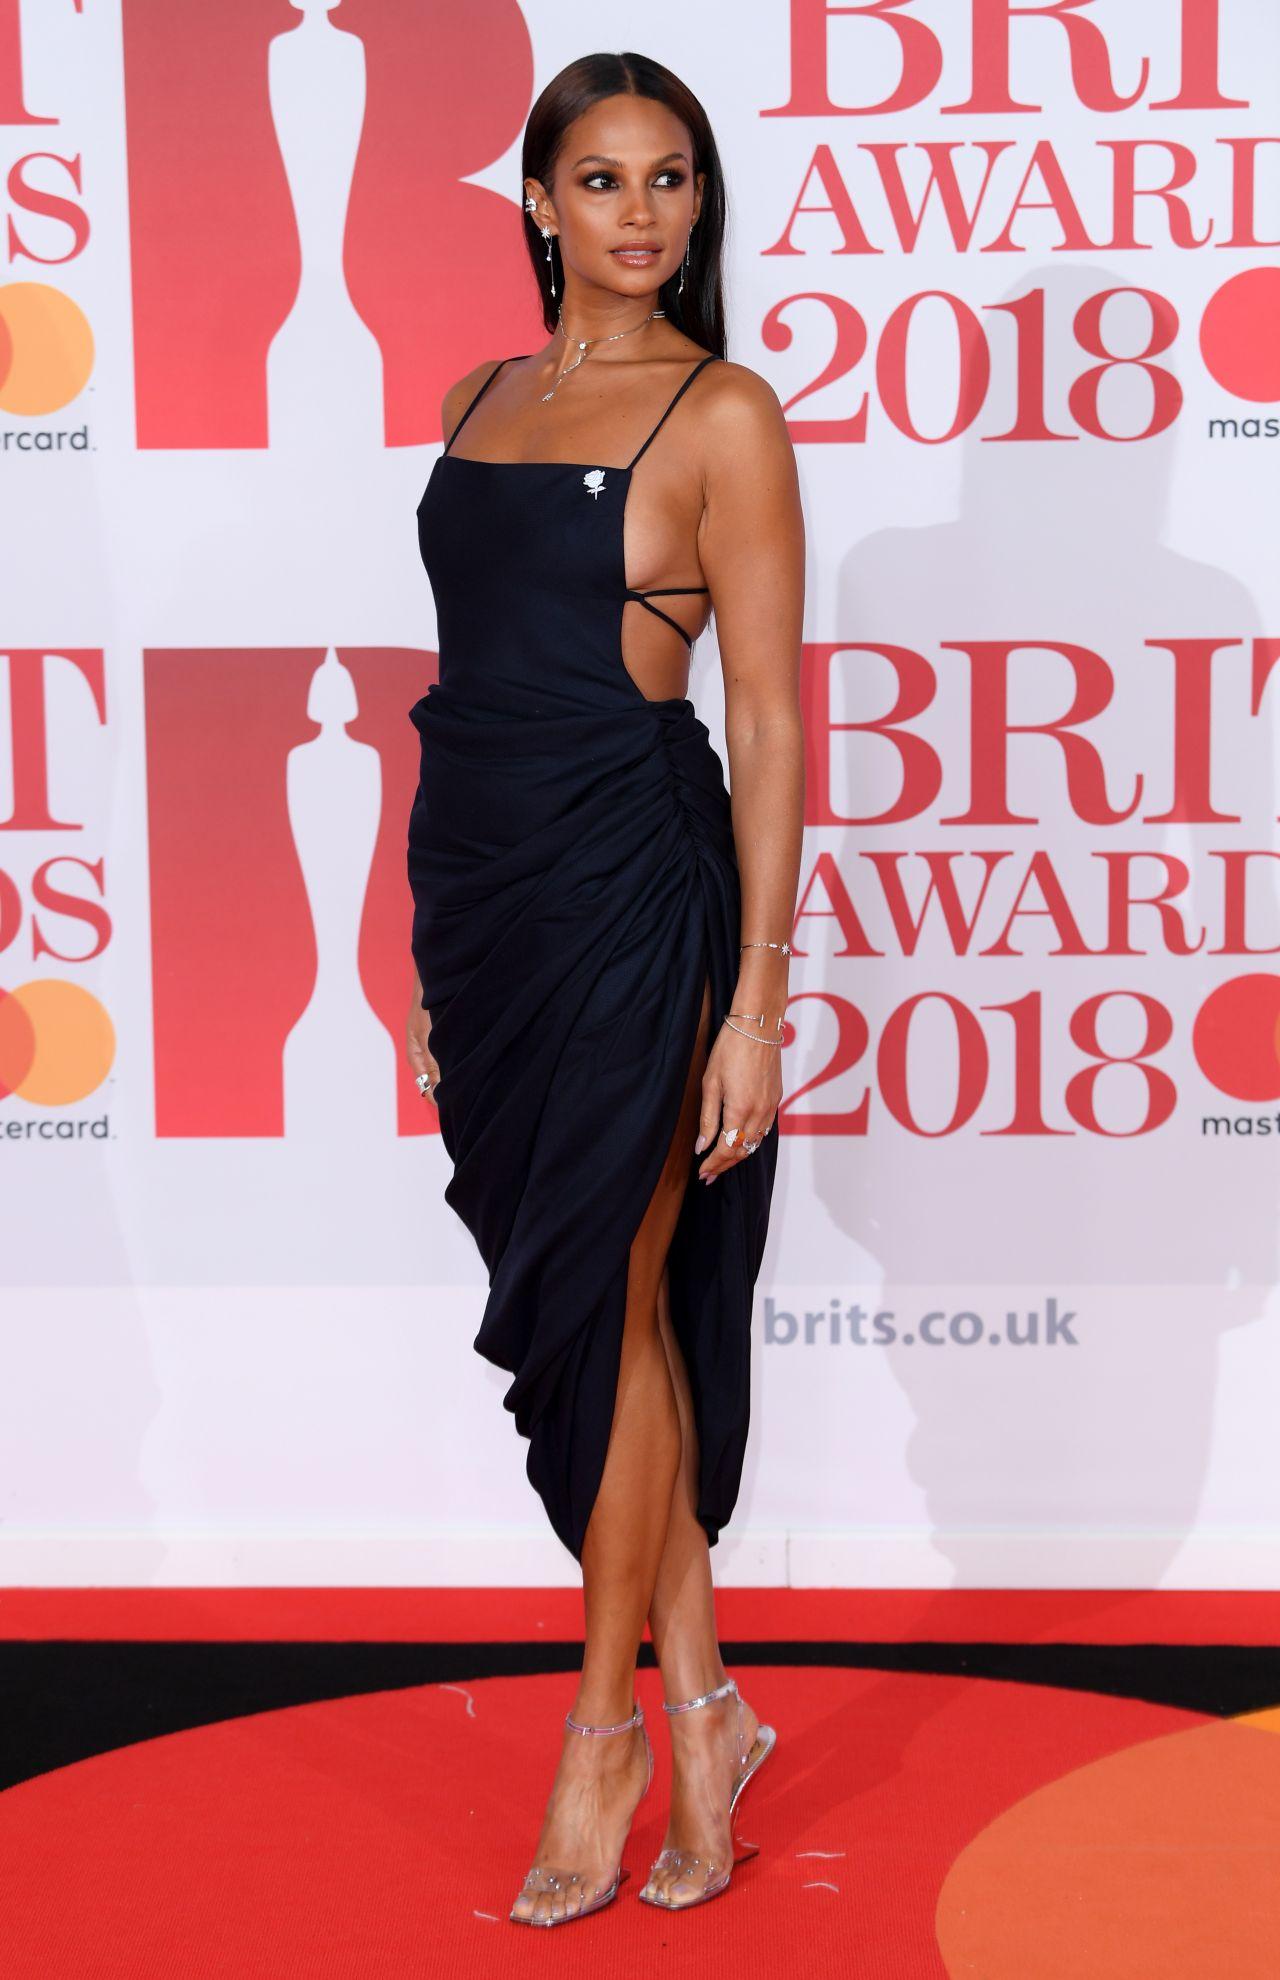 Alesha Dixon 2018 Brit Awards In London More Pics